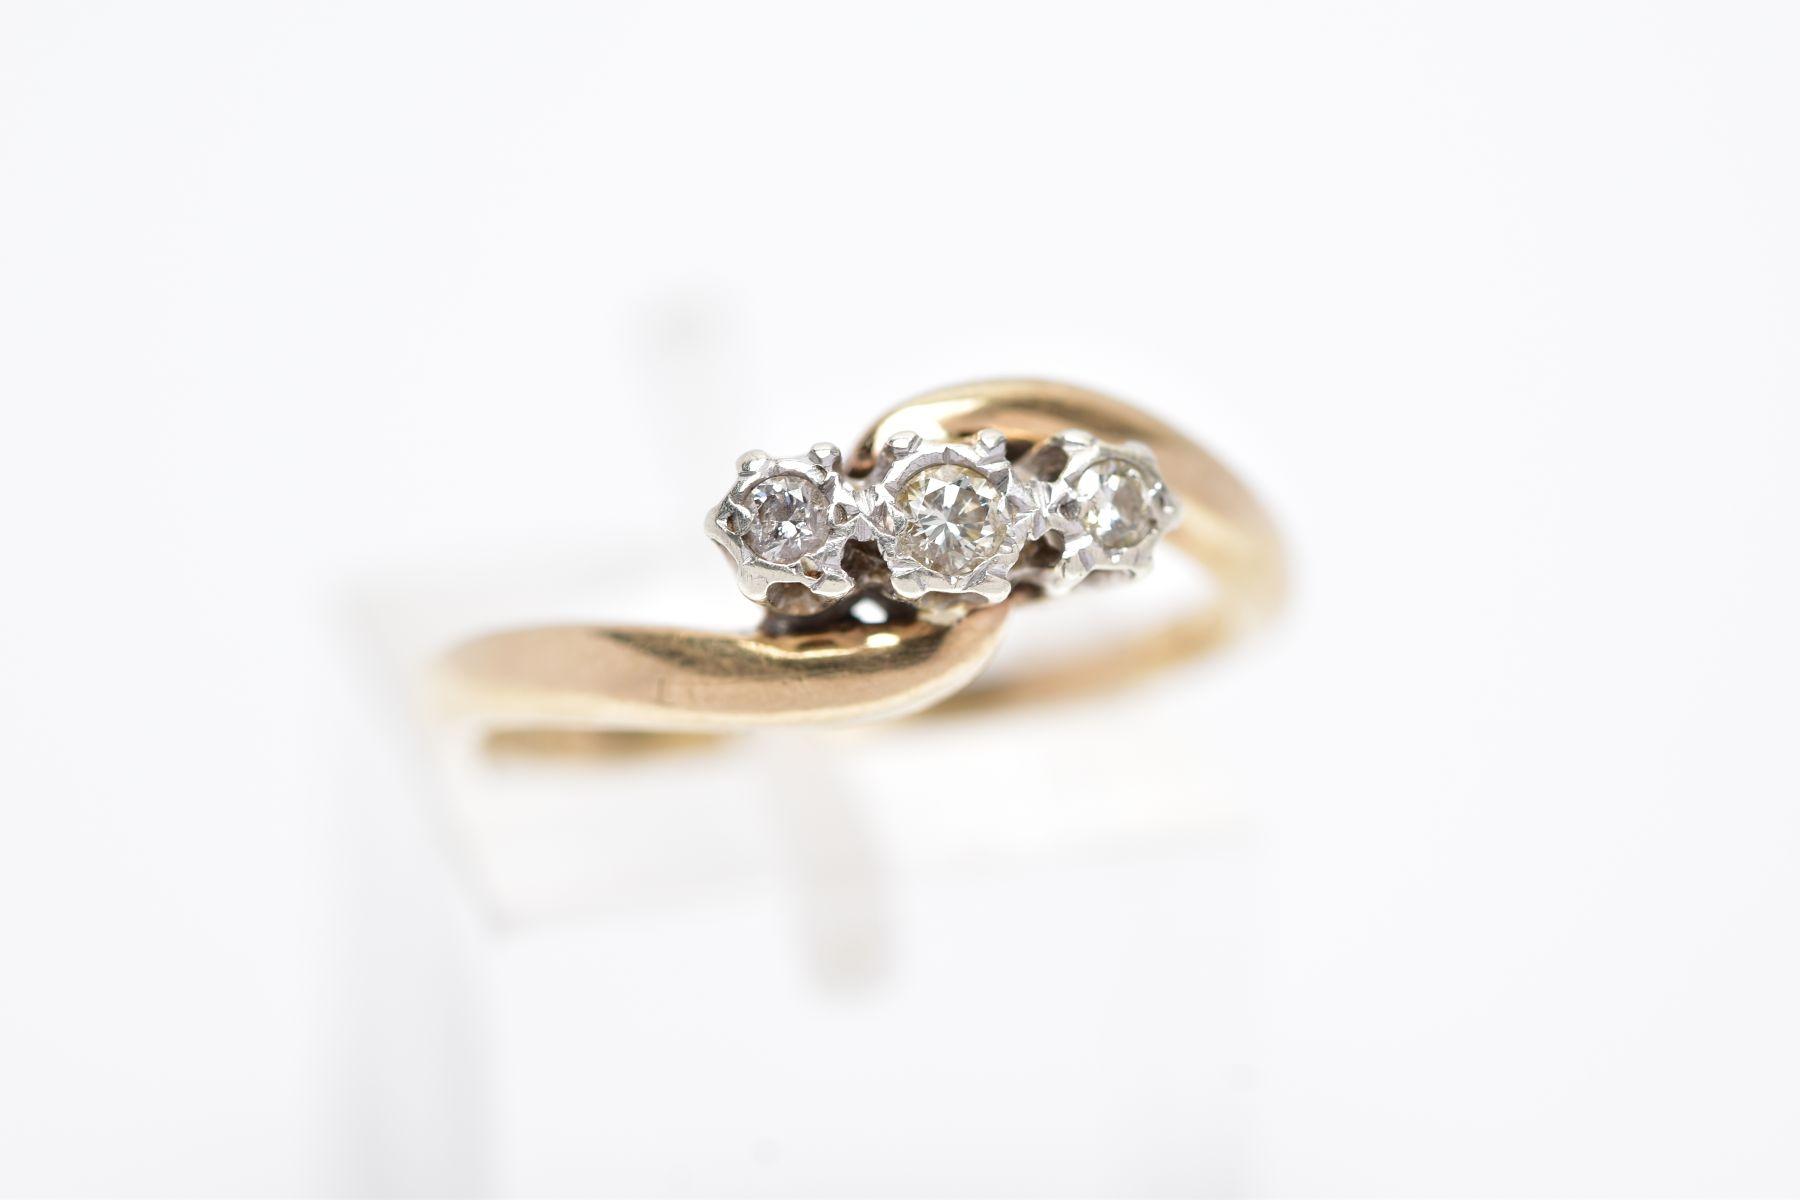 A 9CT GOLD THREE STONE DIAMOND RING, designed with three graduated round brilliant cut diamonds, - Image 4 of 4